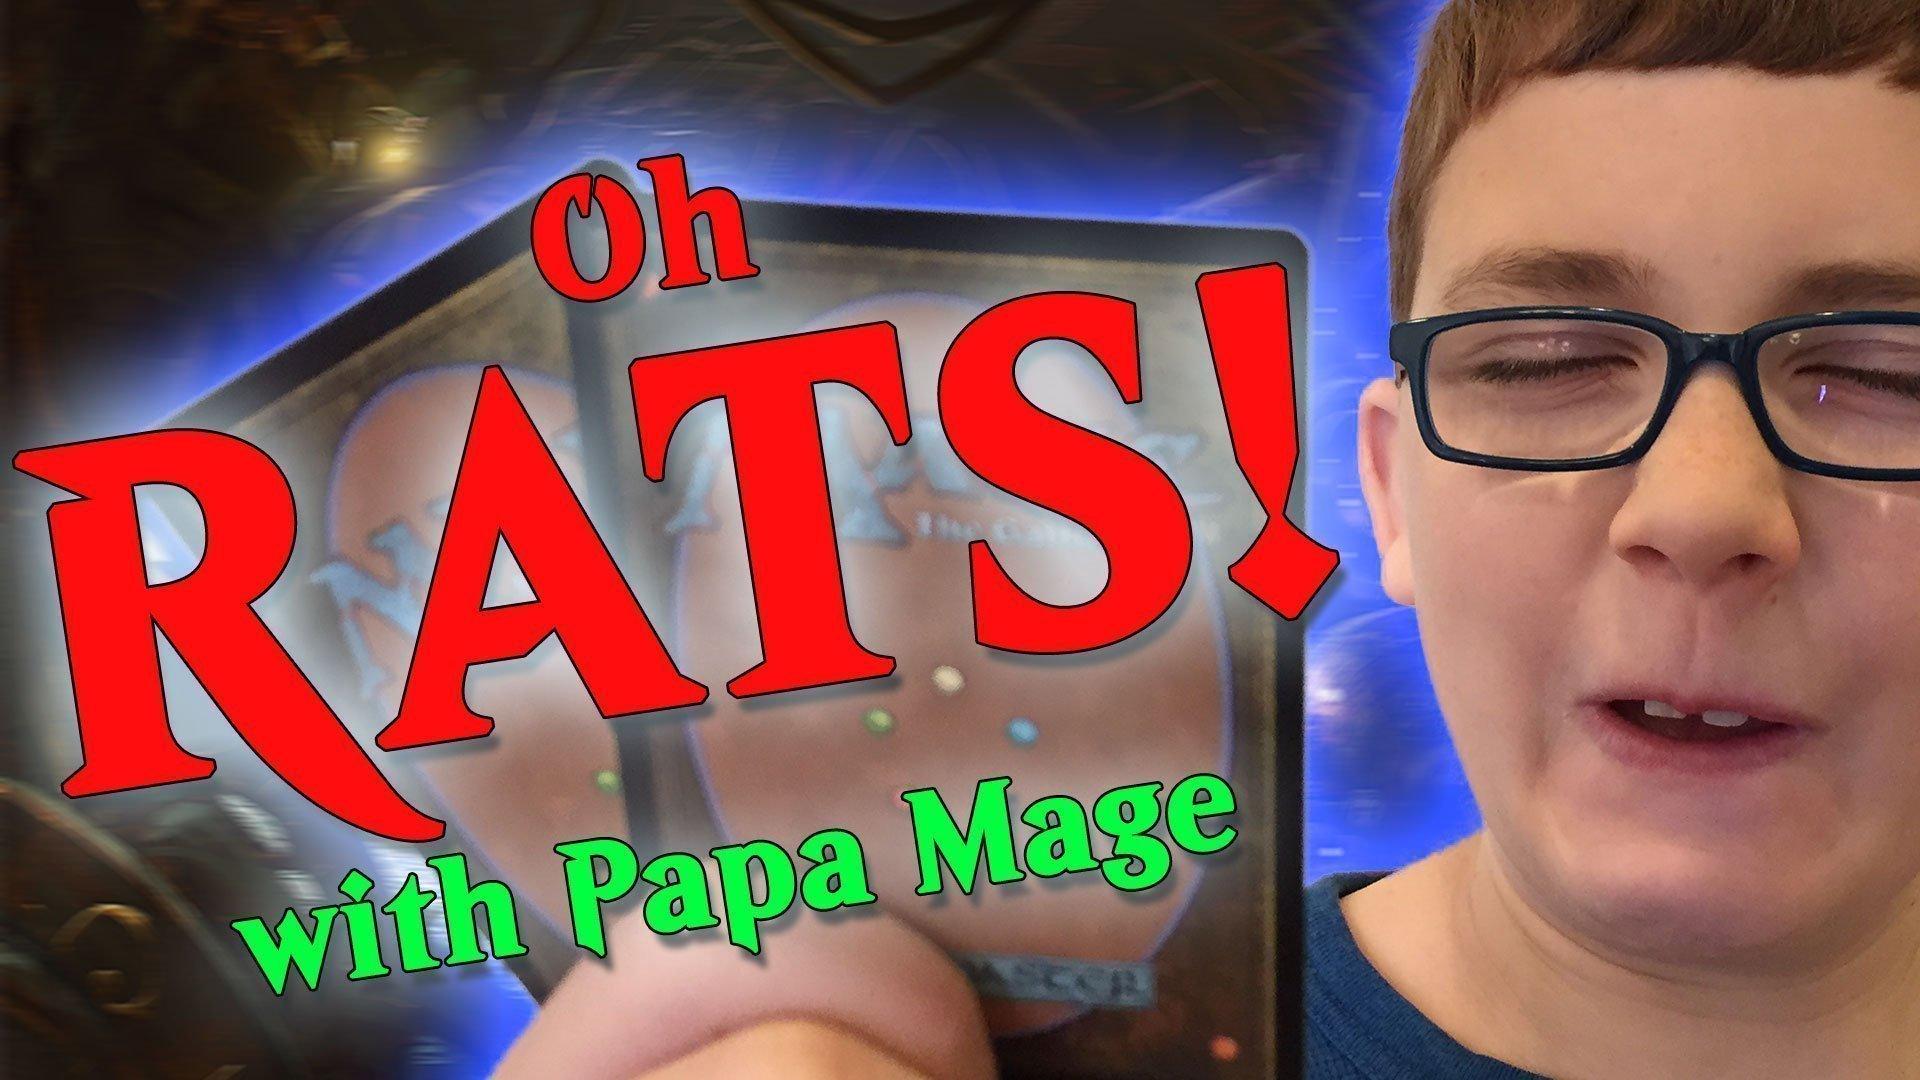 Stories with Papa Mage Plague Rats deck